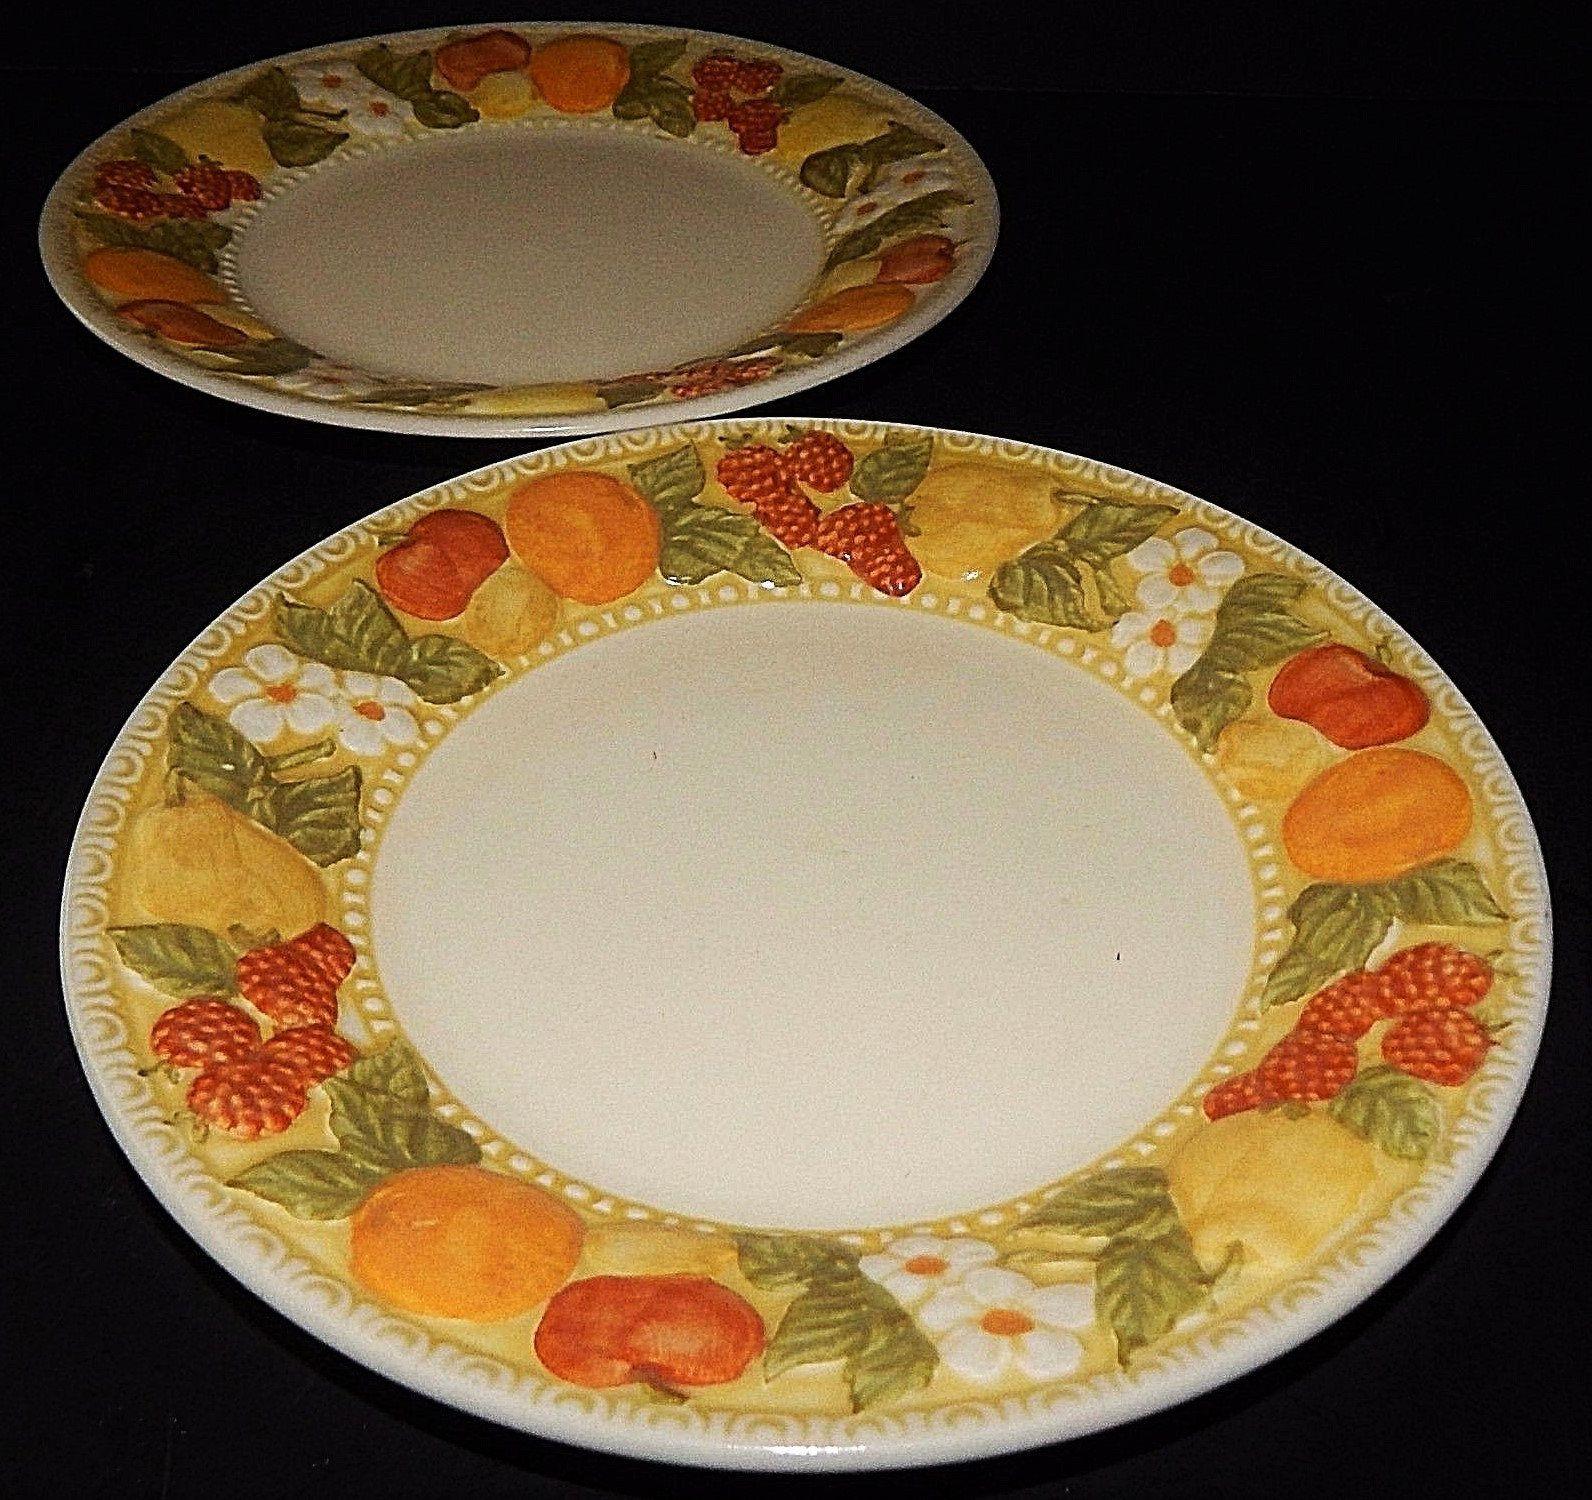 Pin On Dinner Plates